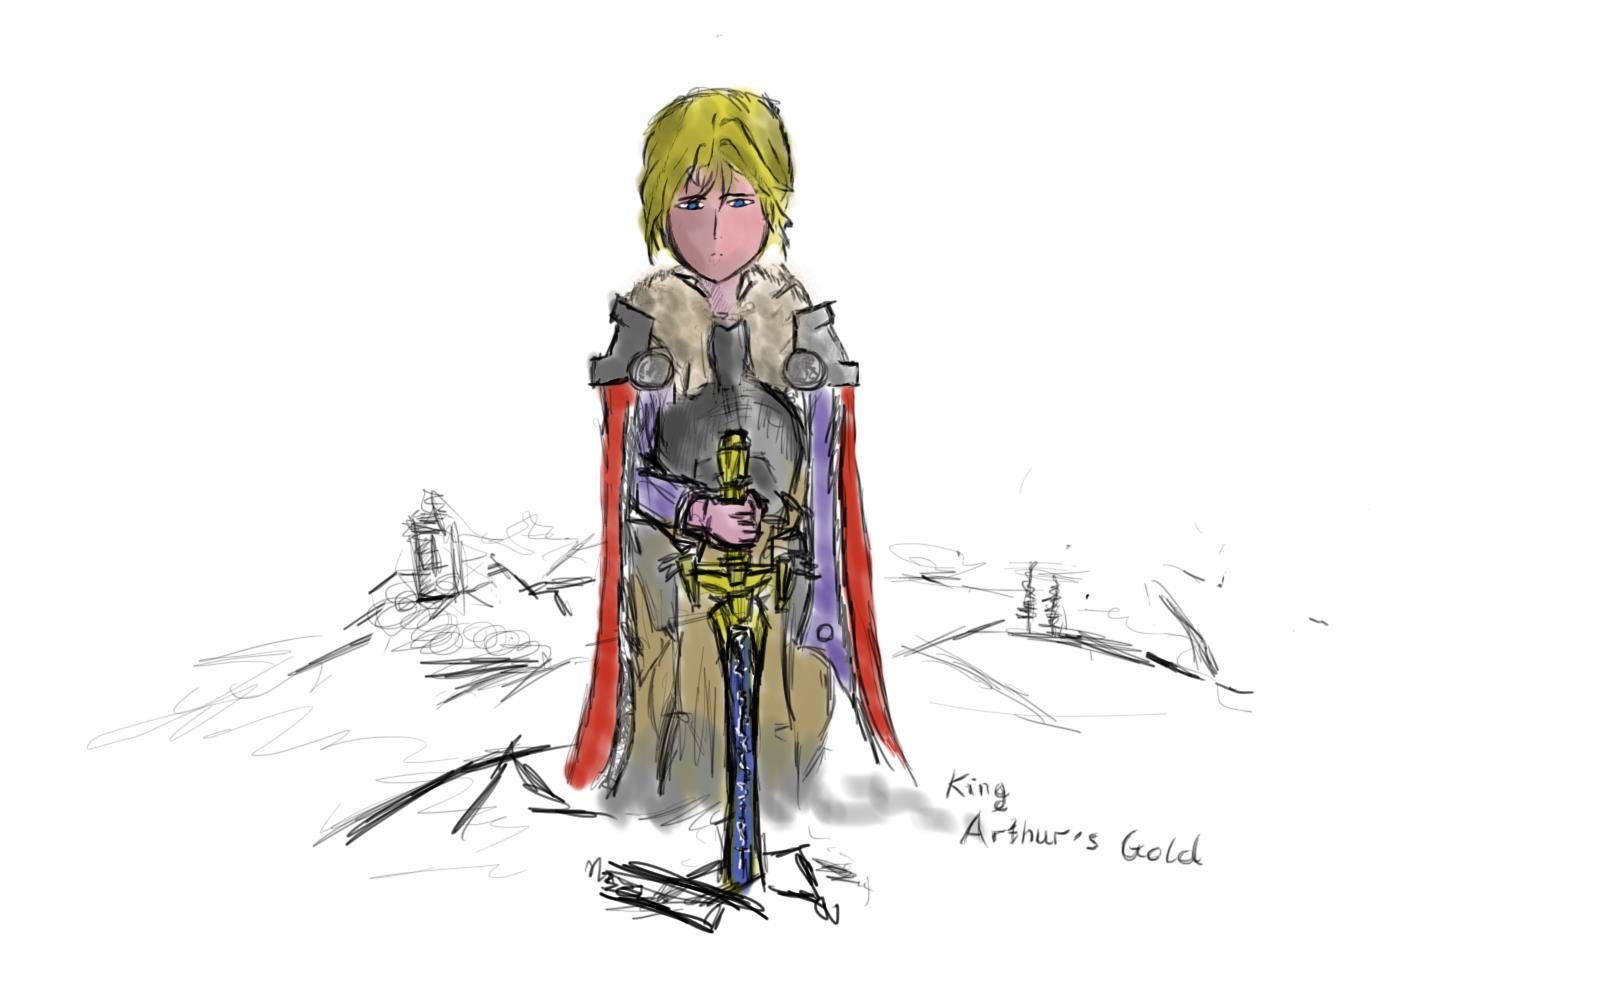 King Arthur's Drawn.jpg